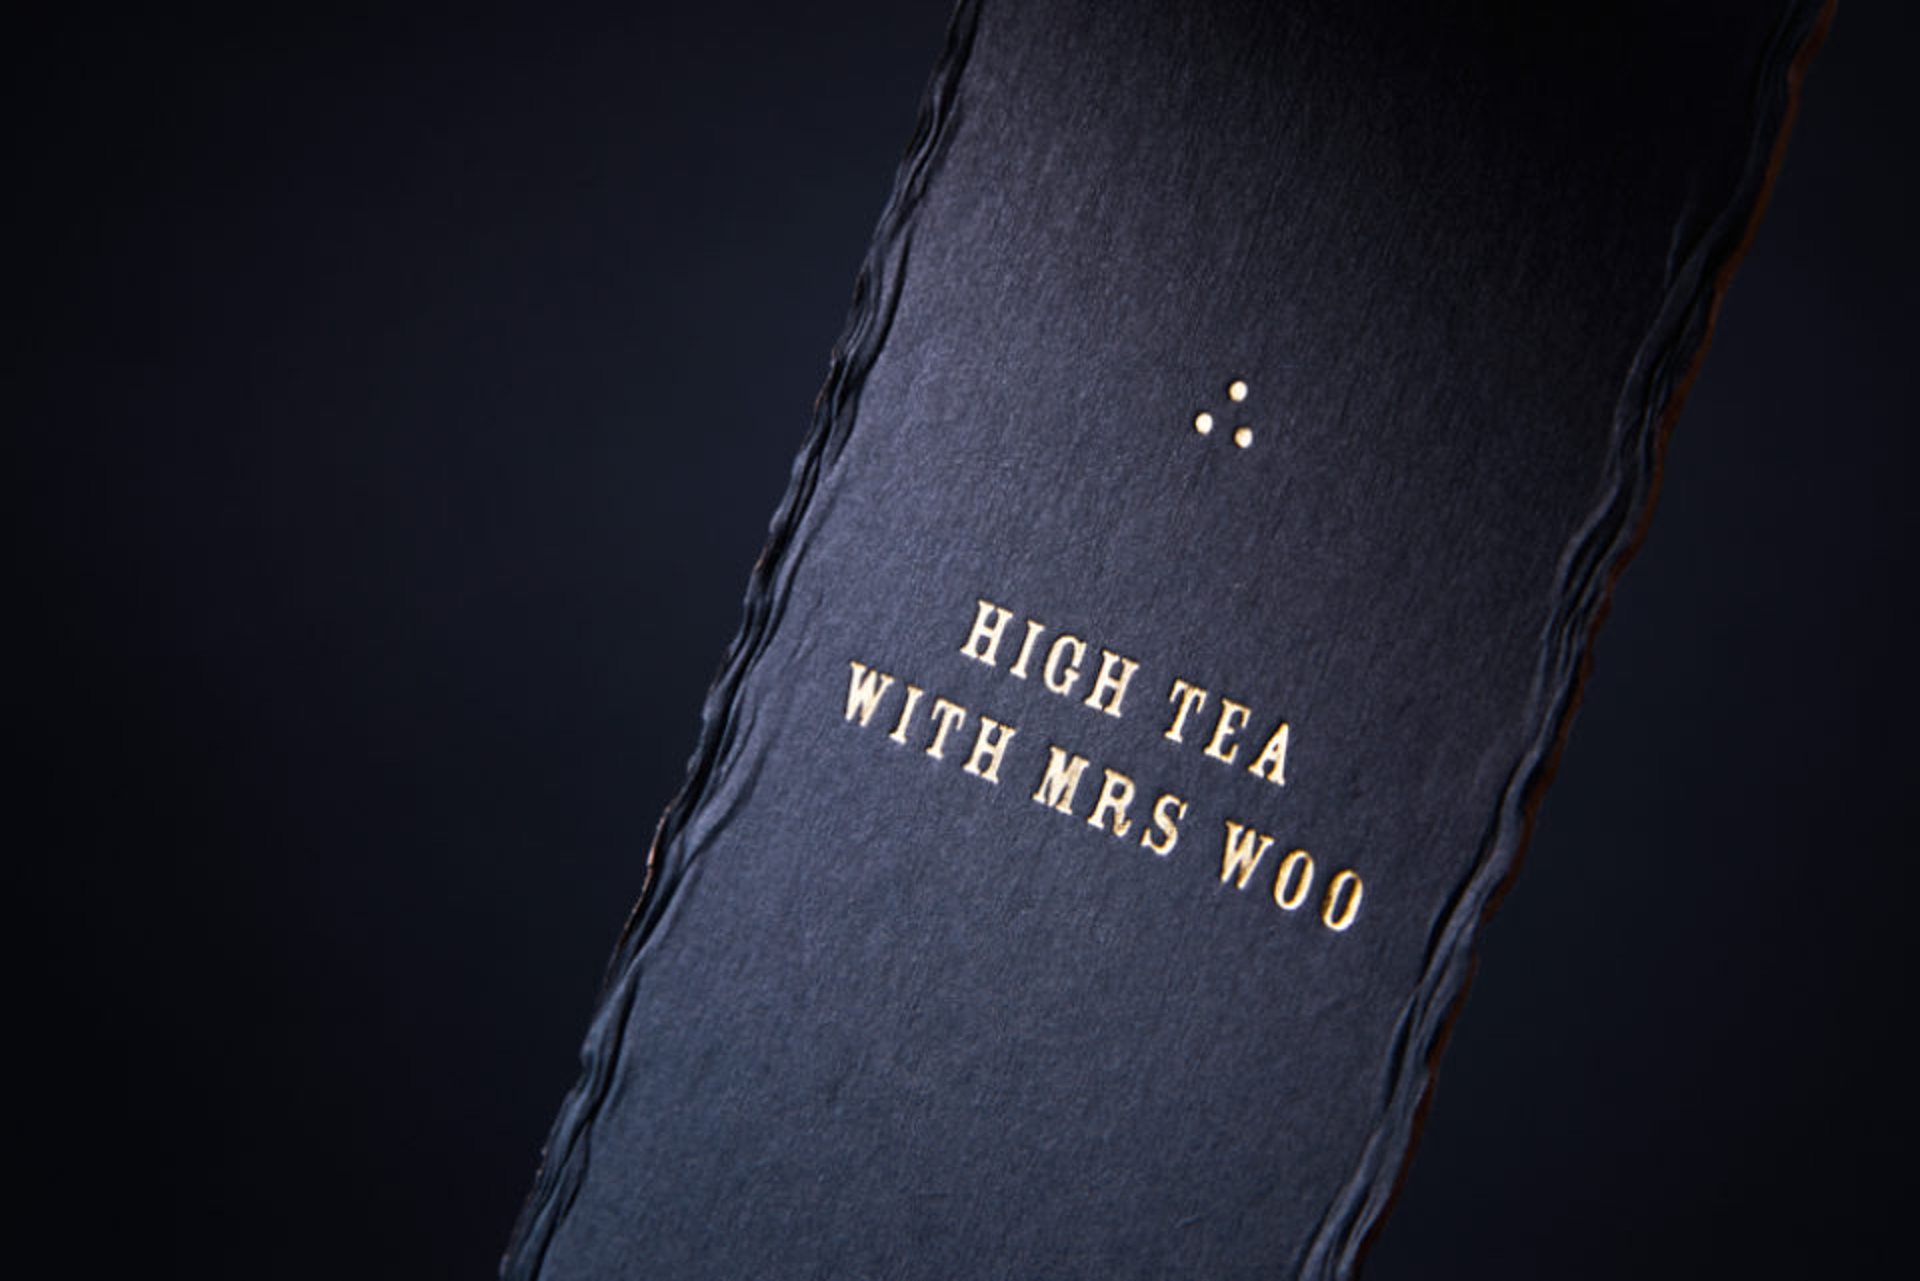 High tea with mrs woo image 05